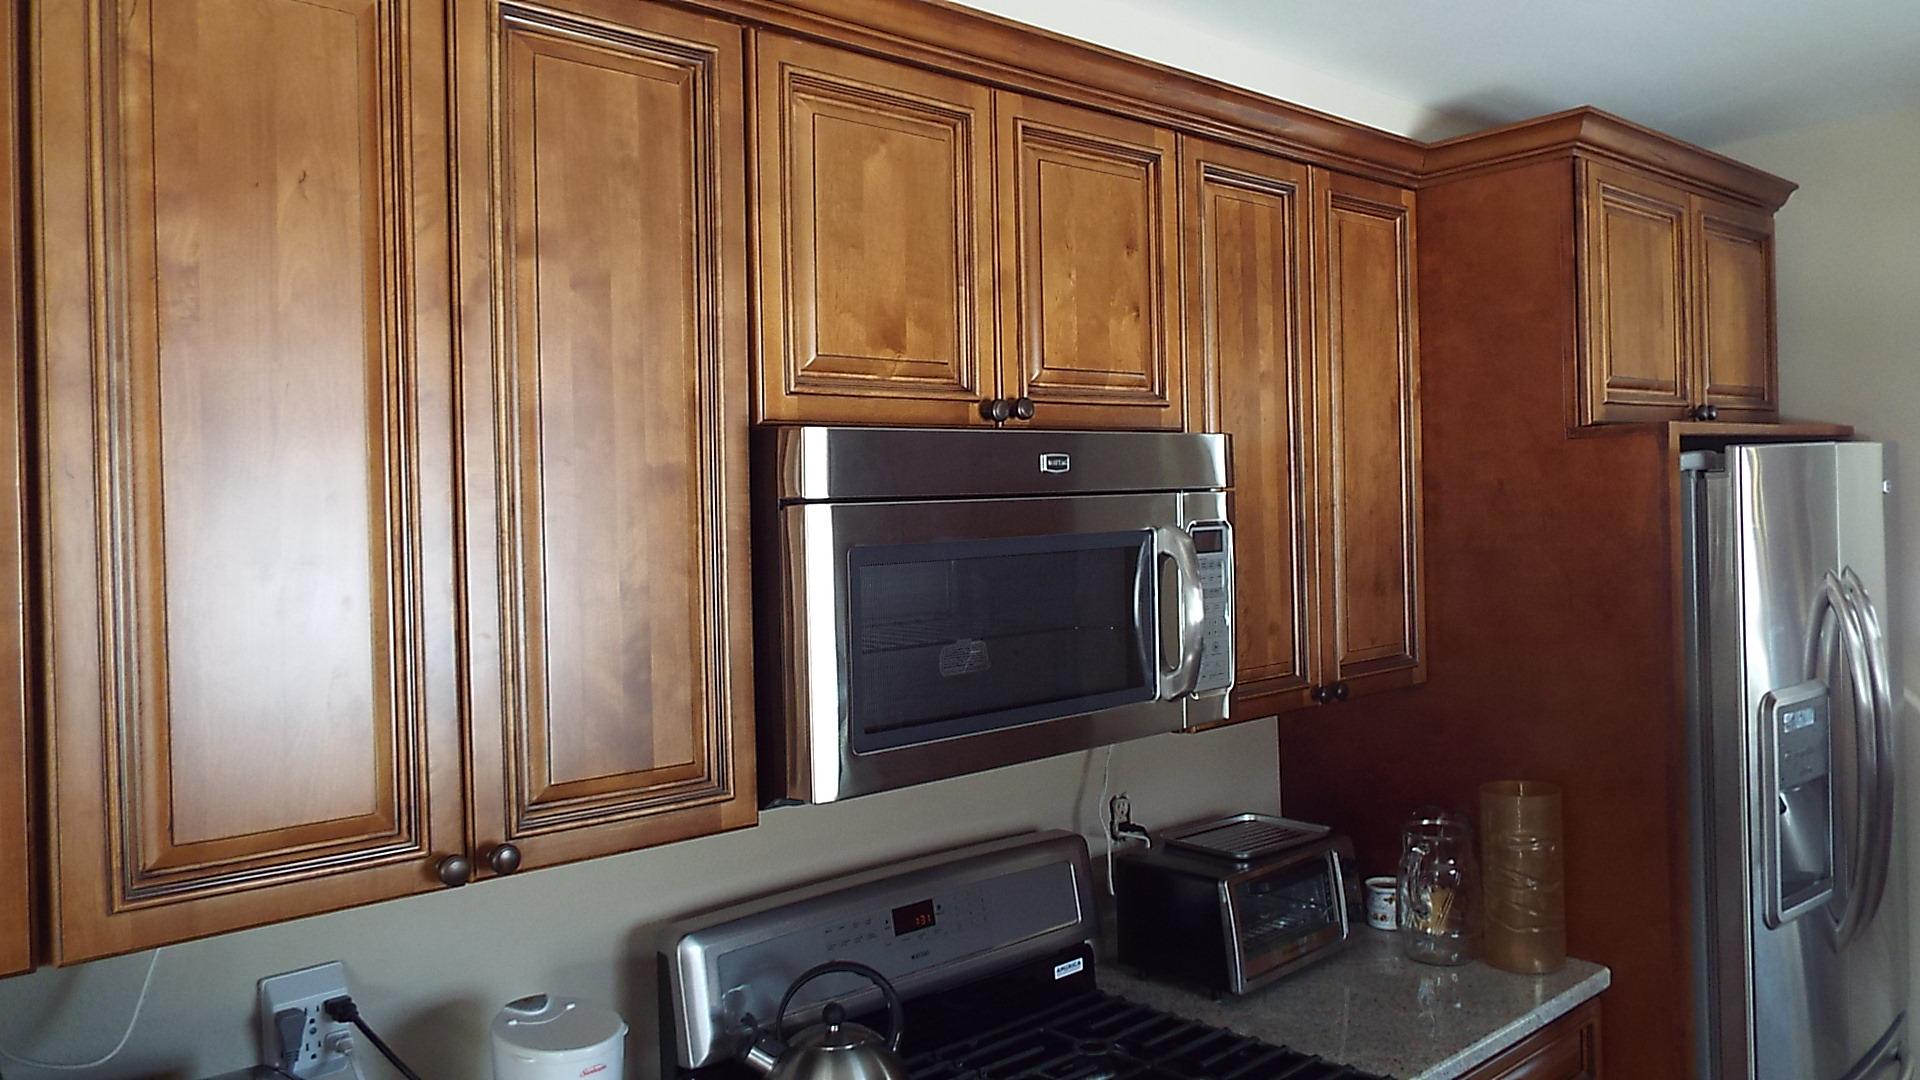 Design Decorating & Kitchens LLC image 3